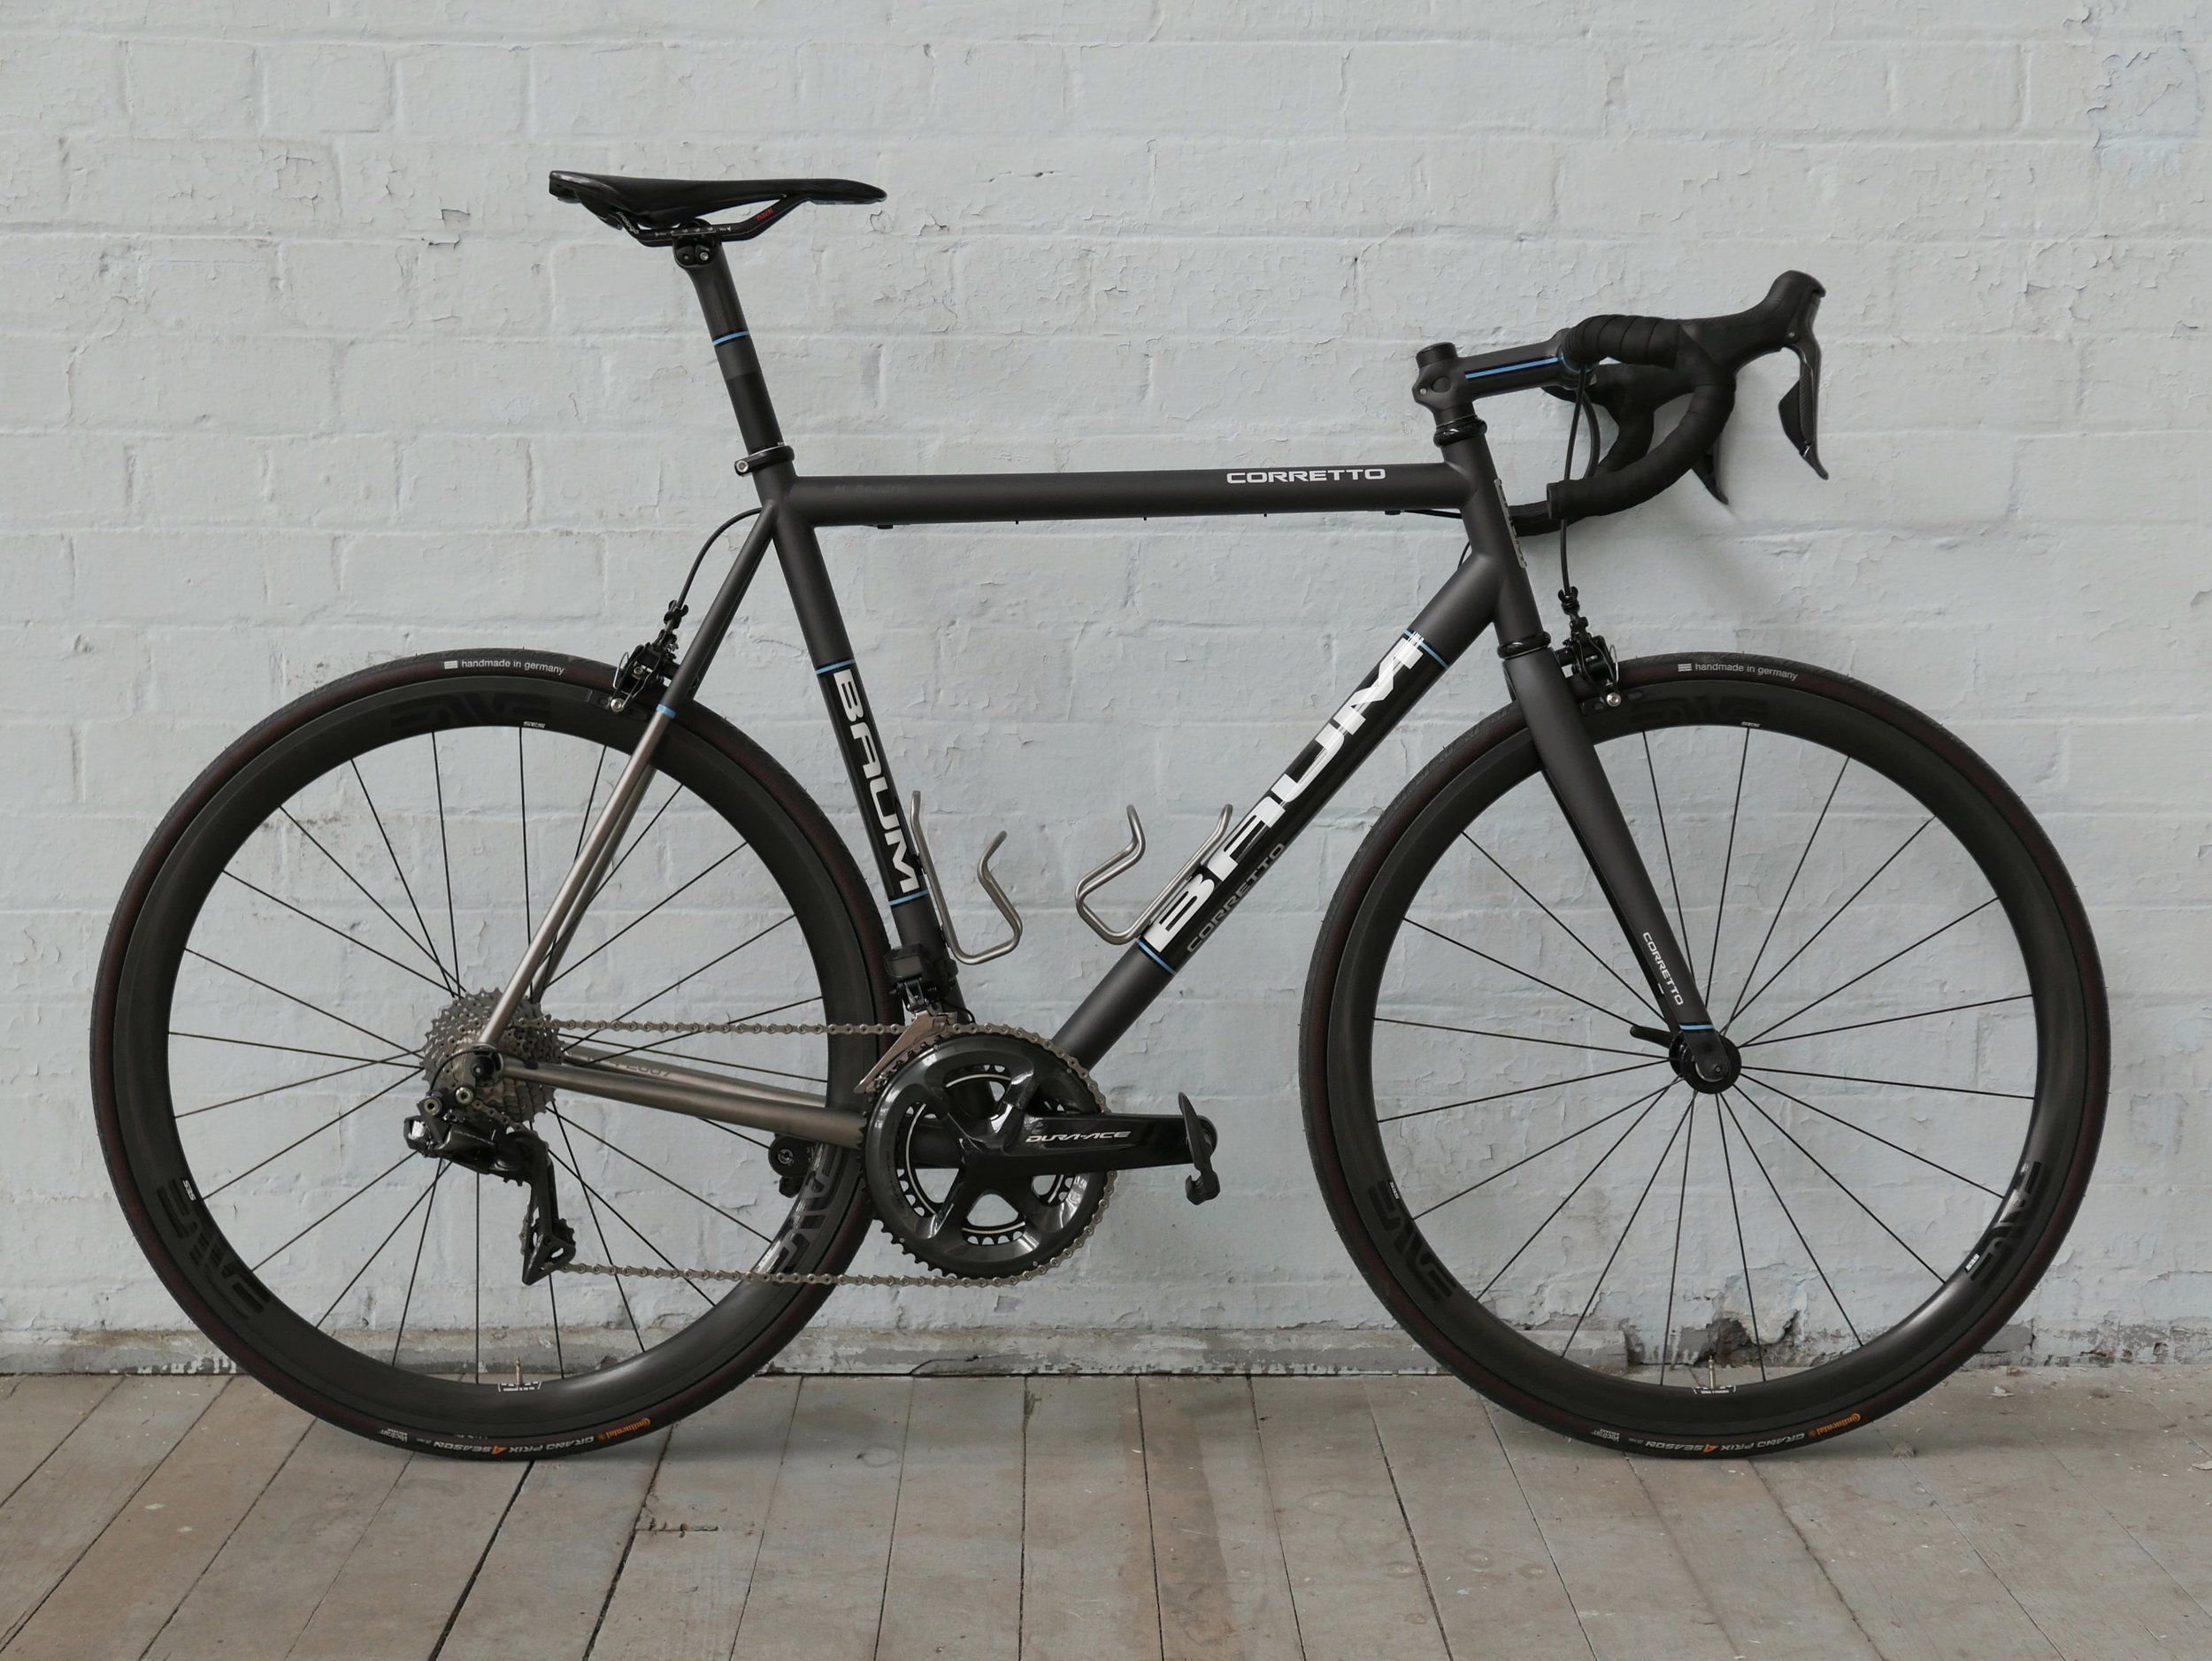 What it's like to buy a Baum Titanium bike, Bike la, Bike